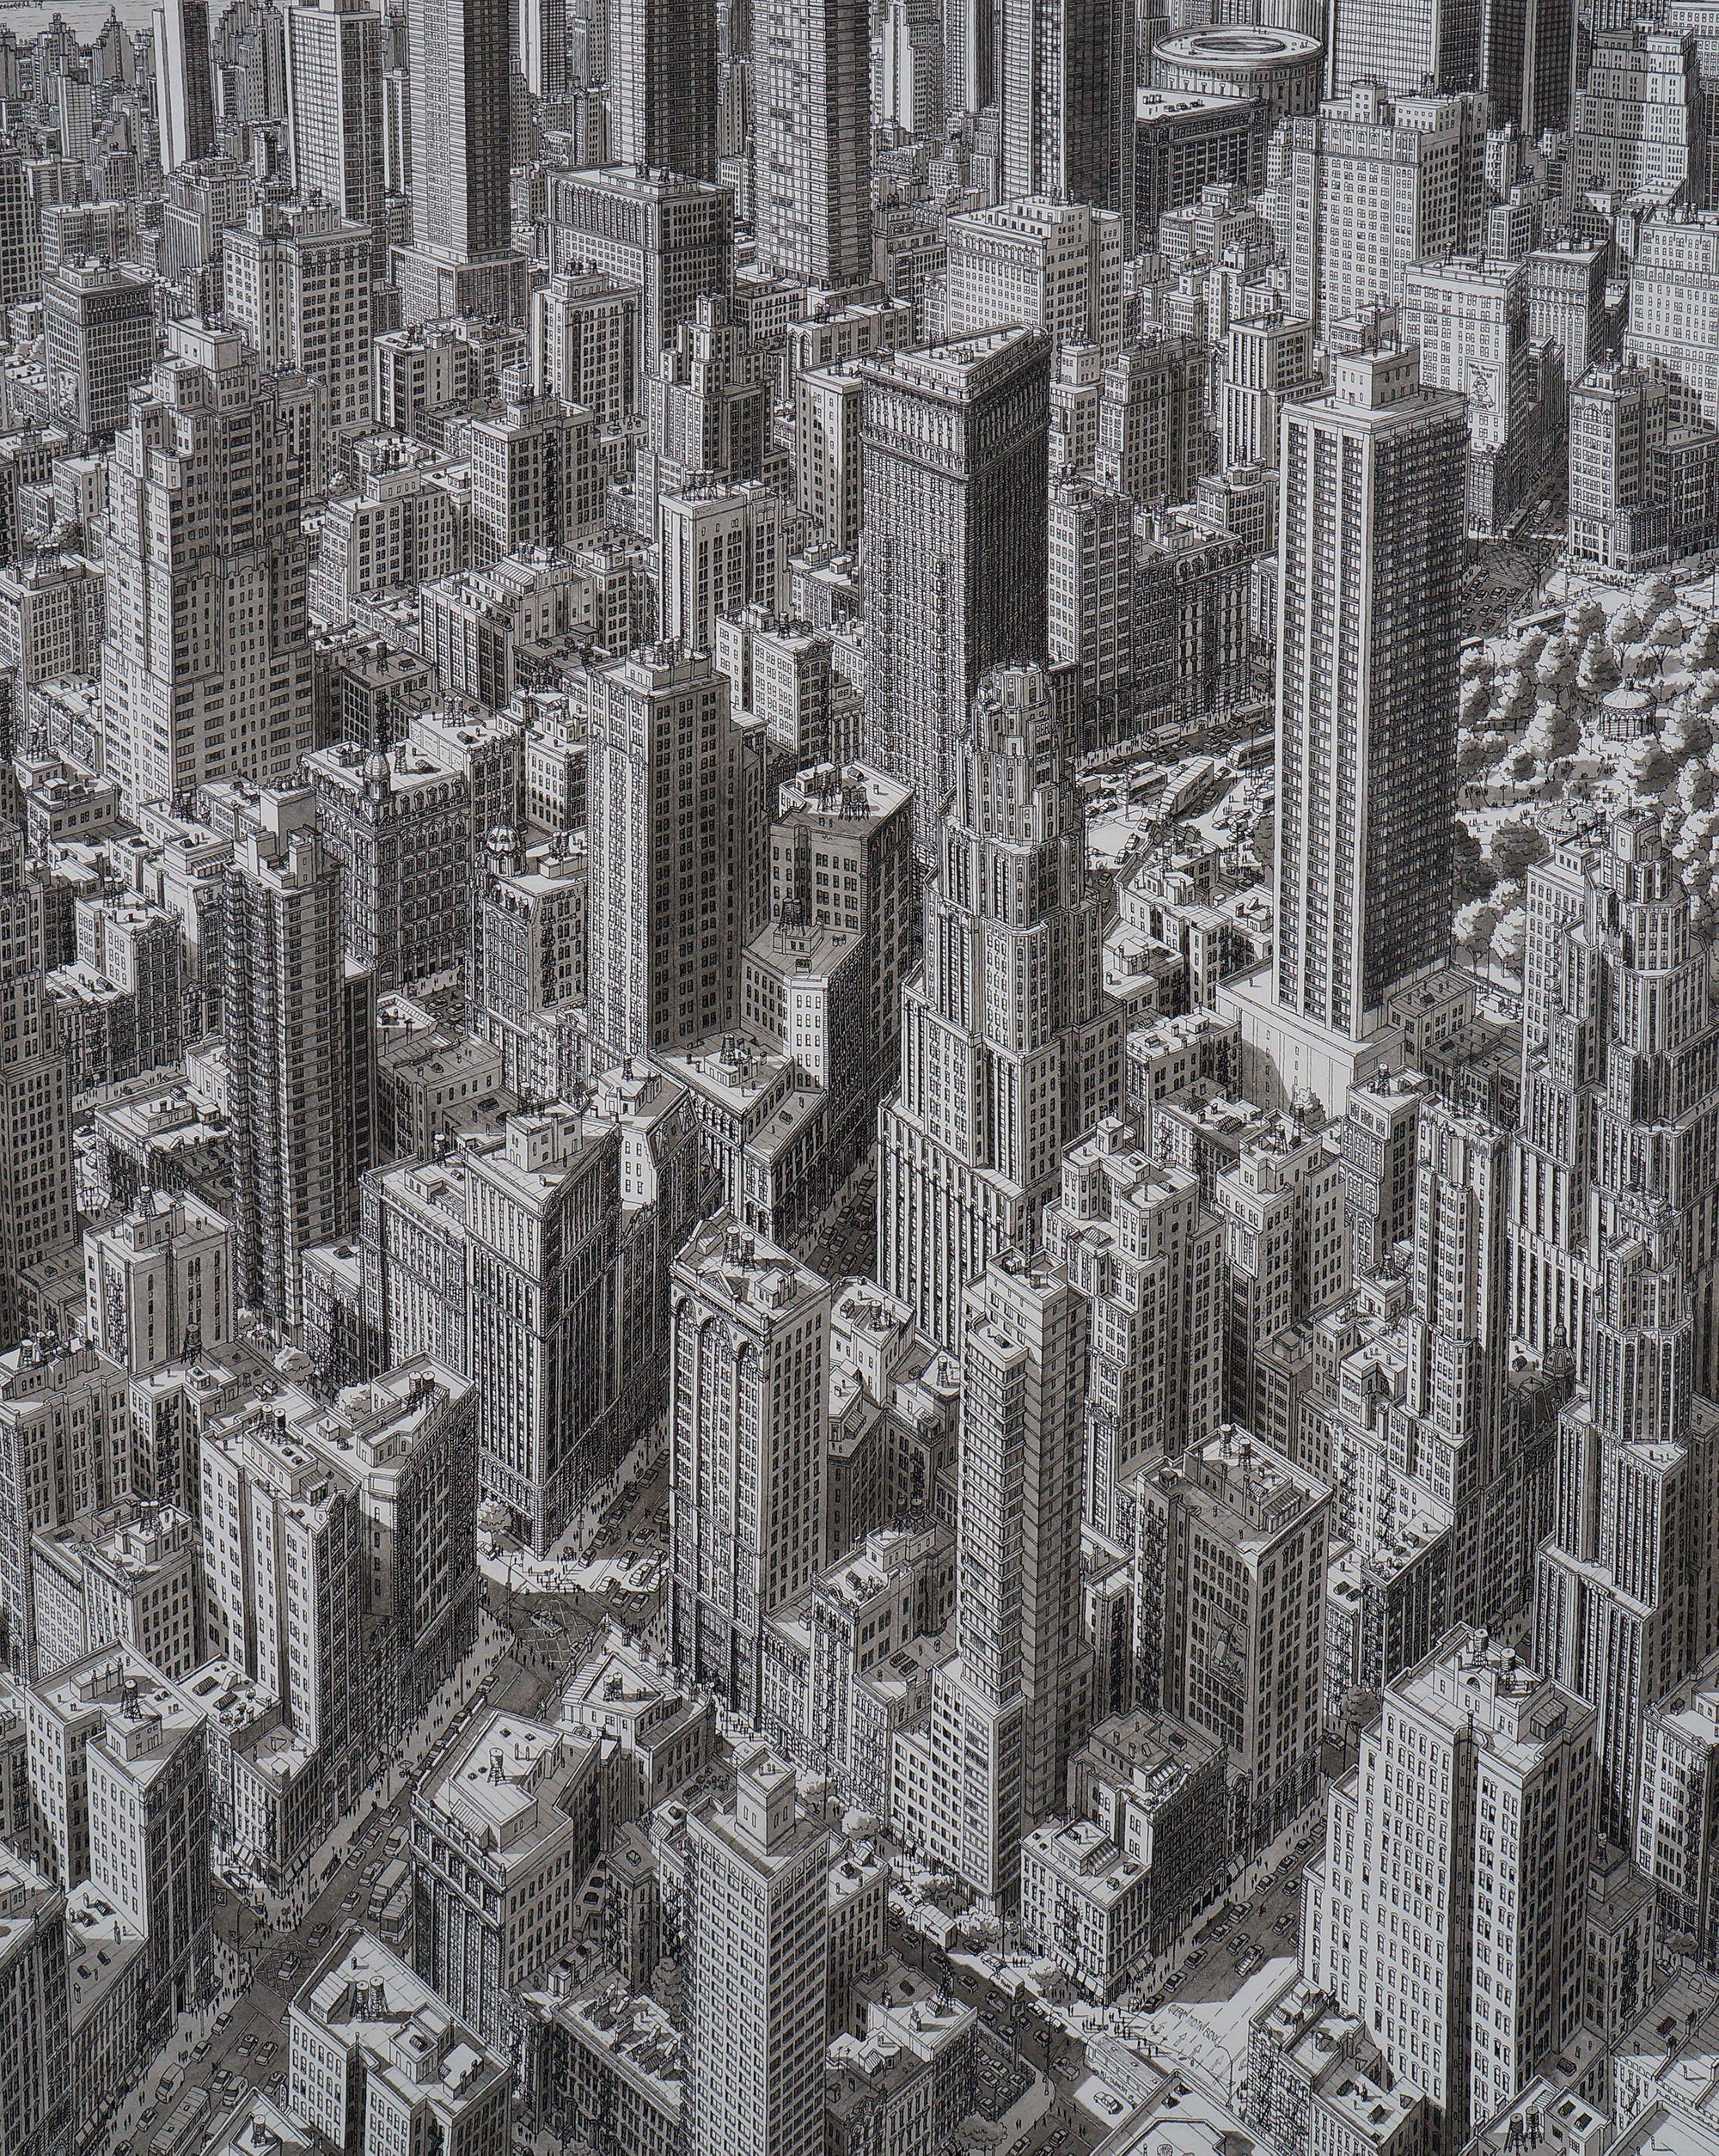 Stefan Bleekrode's Drawings Recreate Cityscapes from Memory